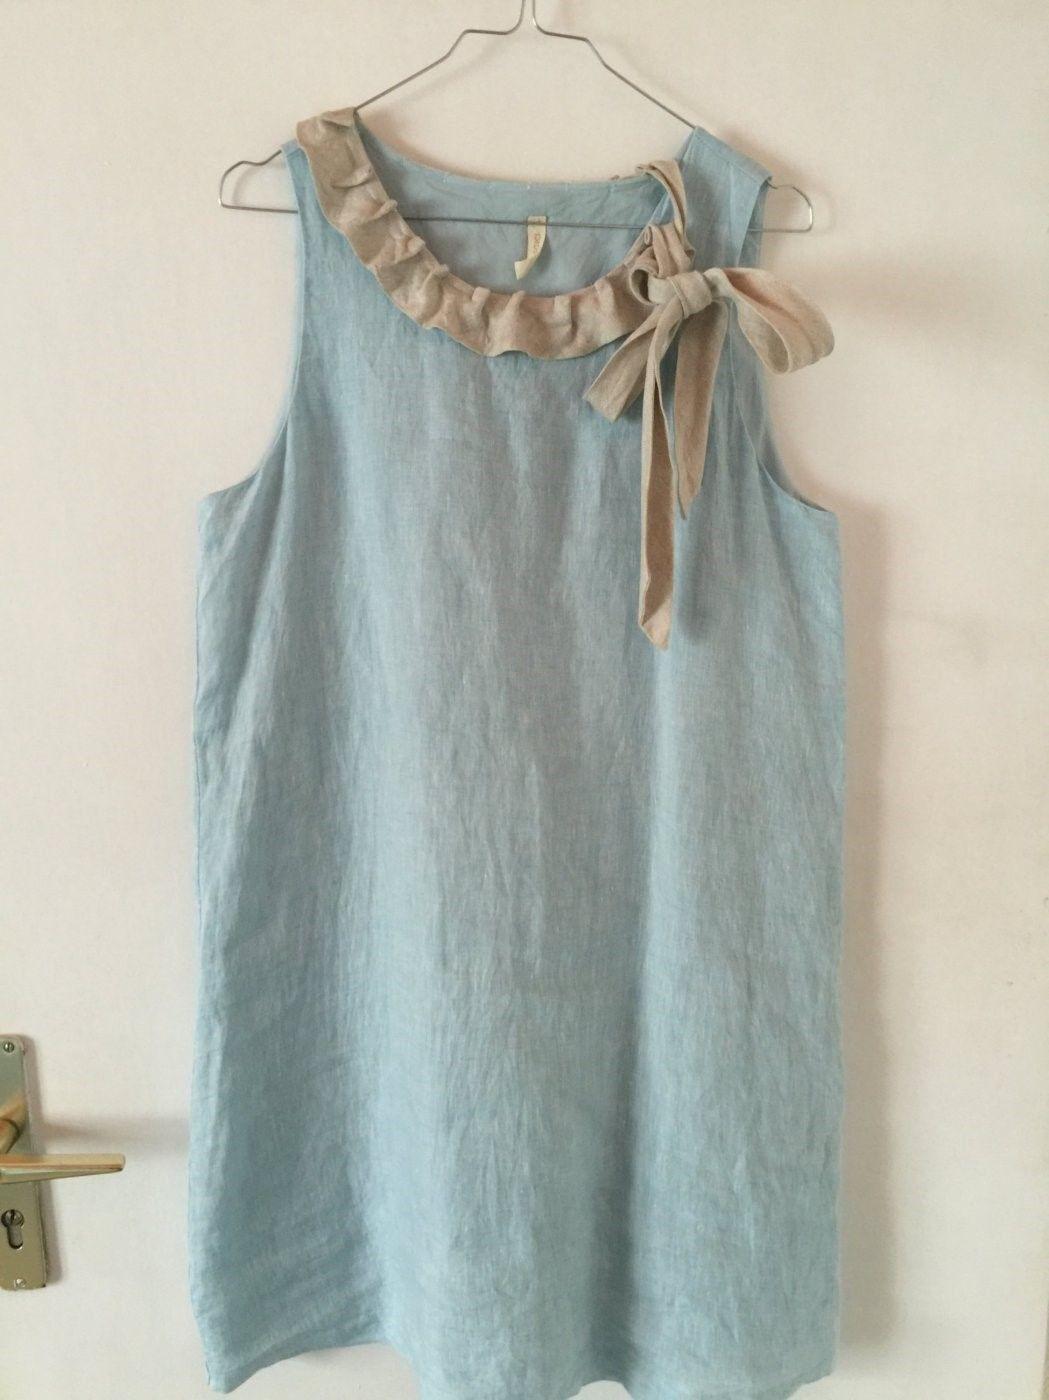 Formal Perfekt Hallhuber Abendkleid Galerie - Abendkleid